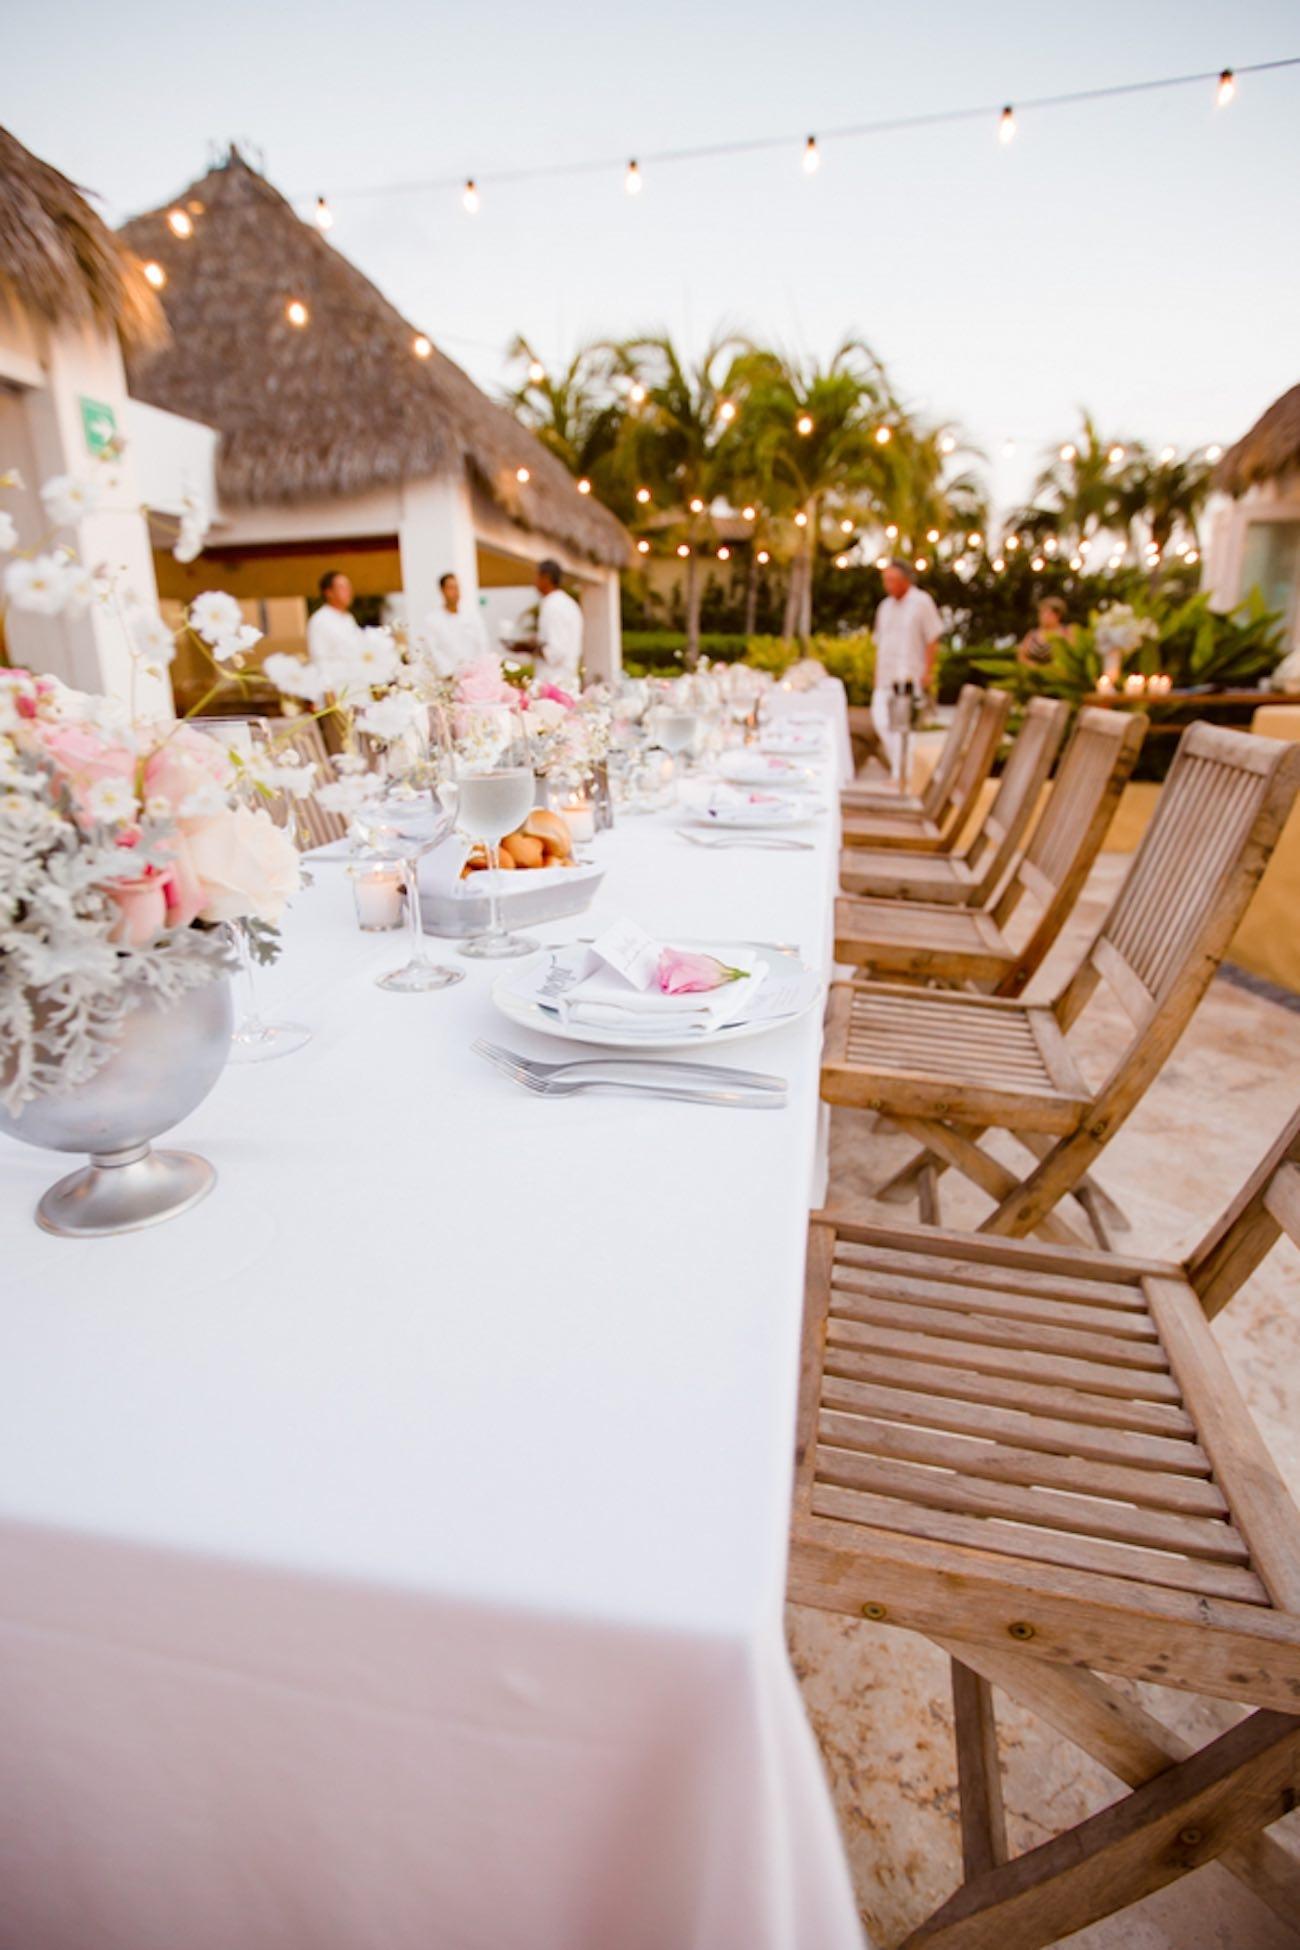 10 Wonderful Ideas For A Beach Wedding %name 2021